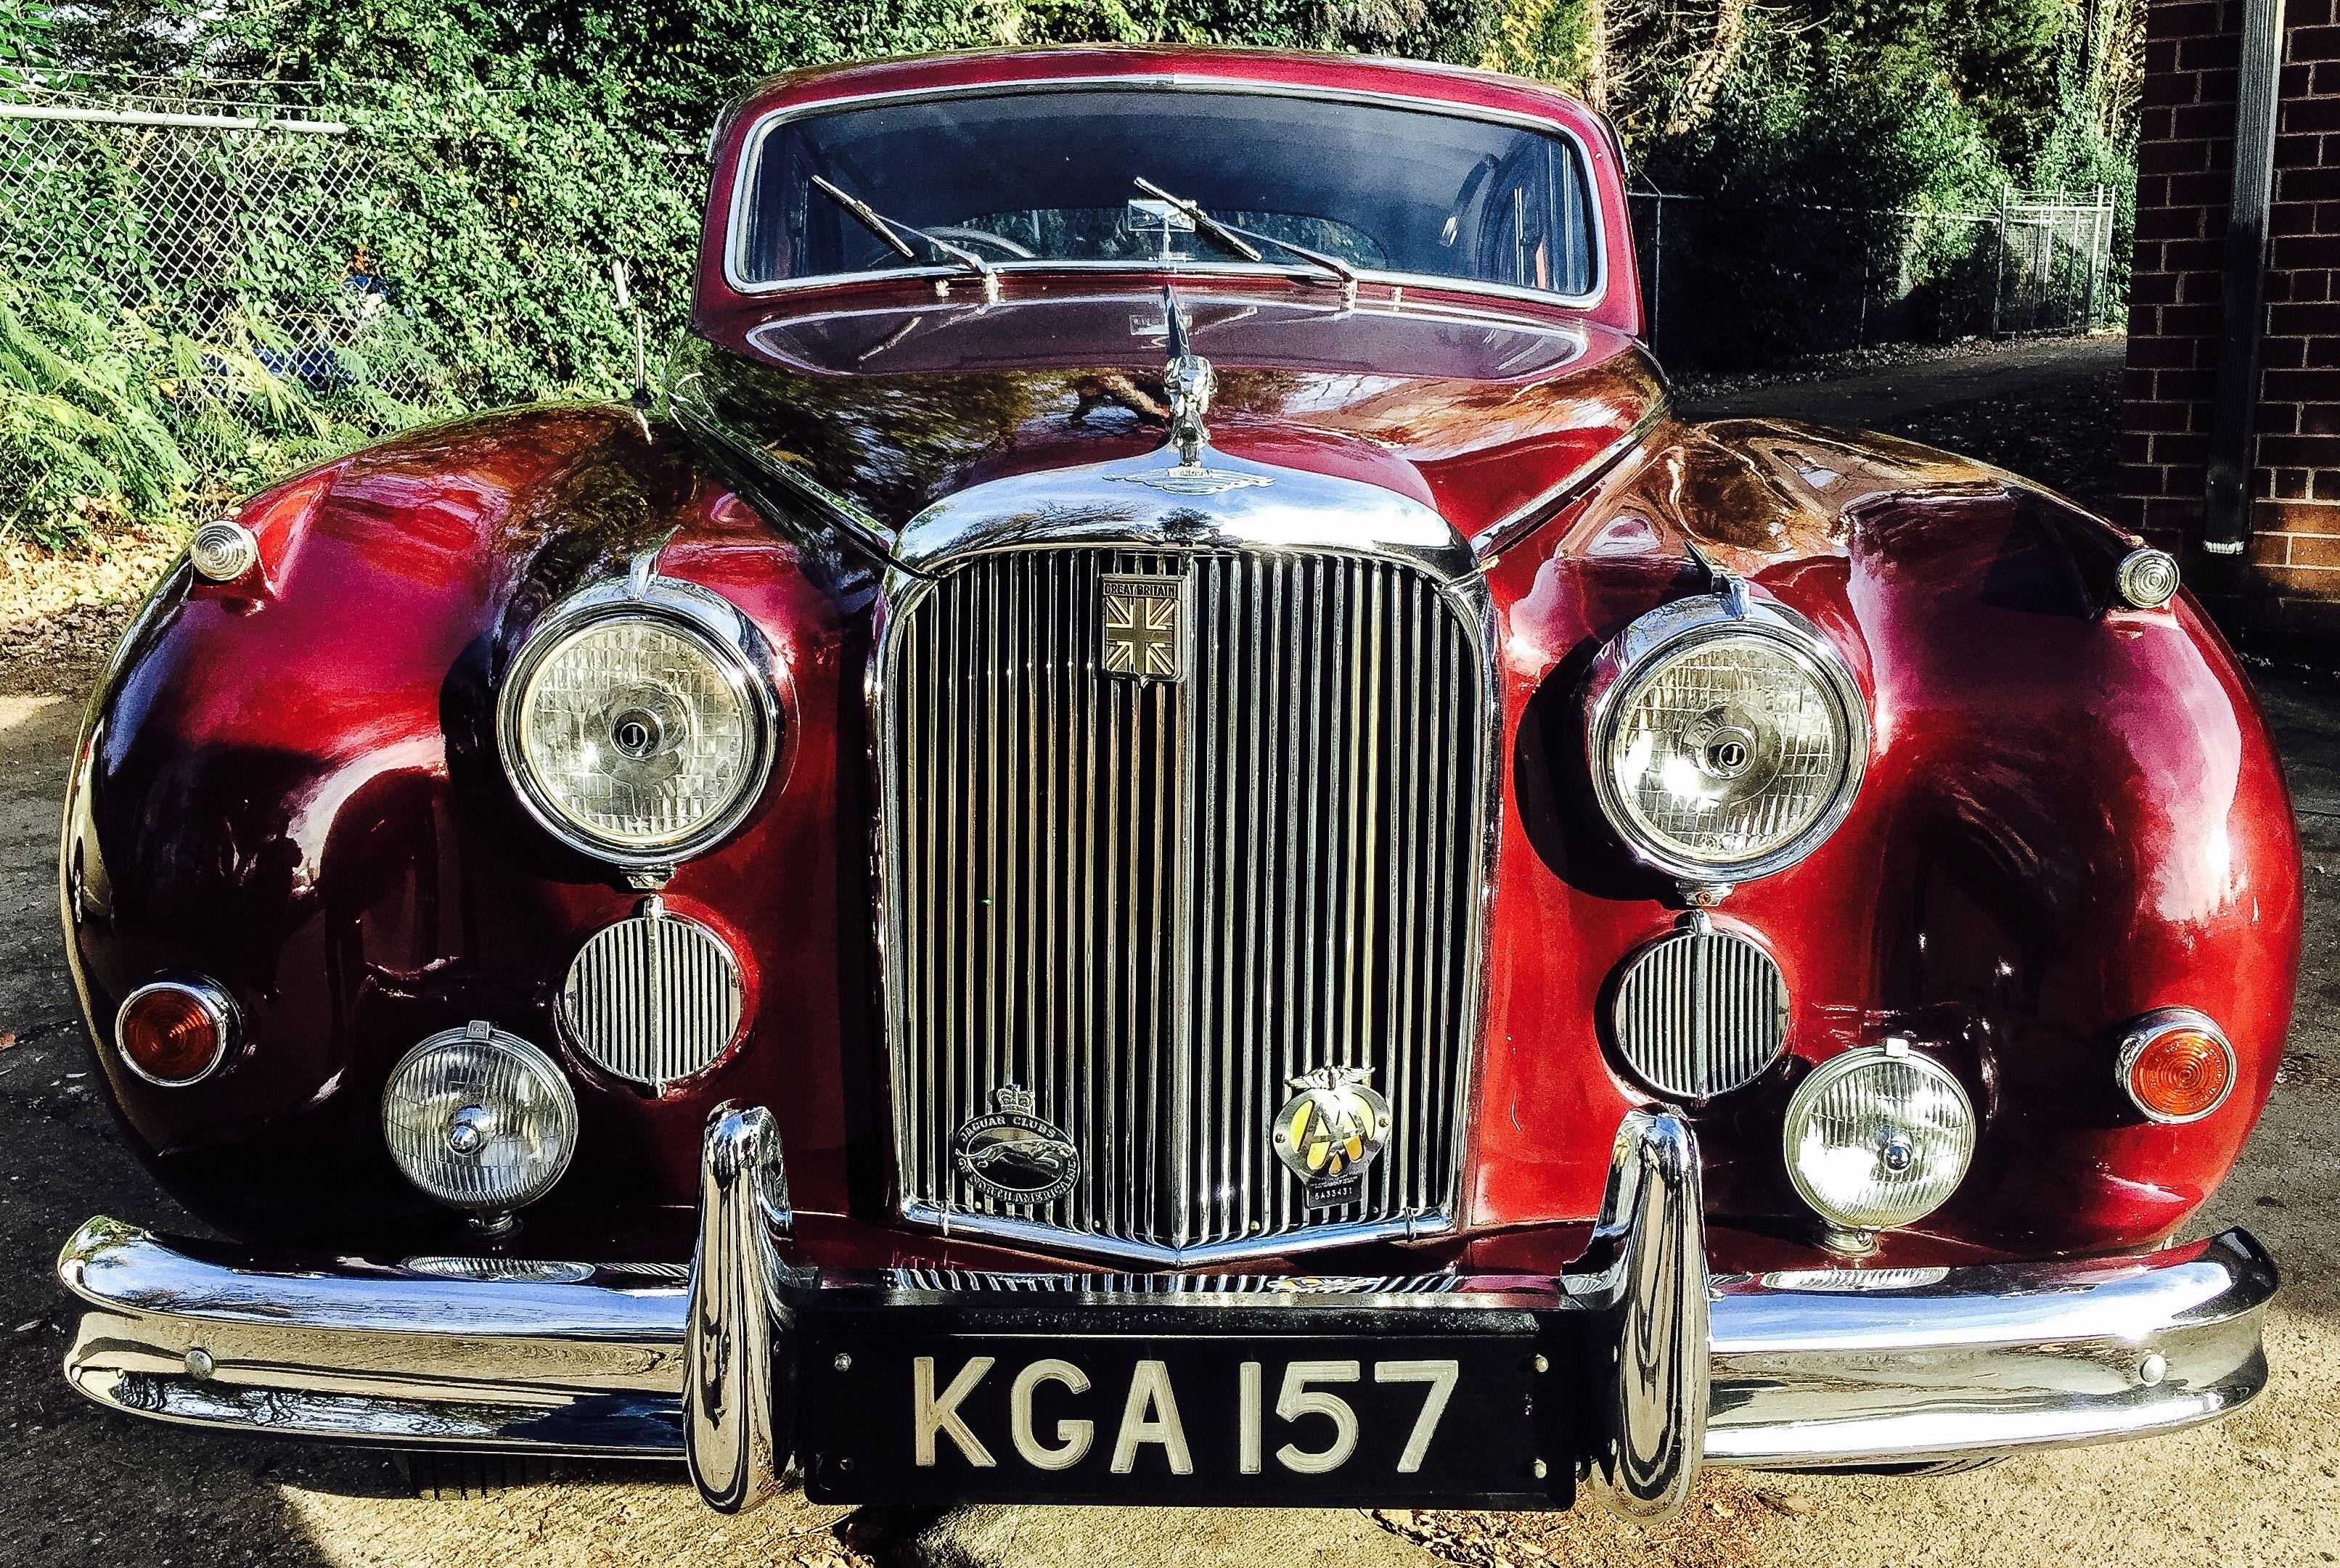 1957 Jaguar Mark VIII Friday March 4th, 2016. GAA